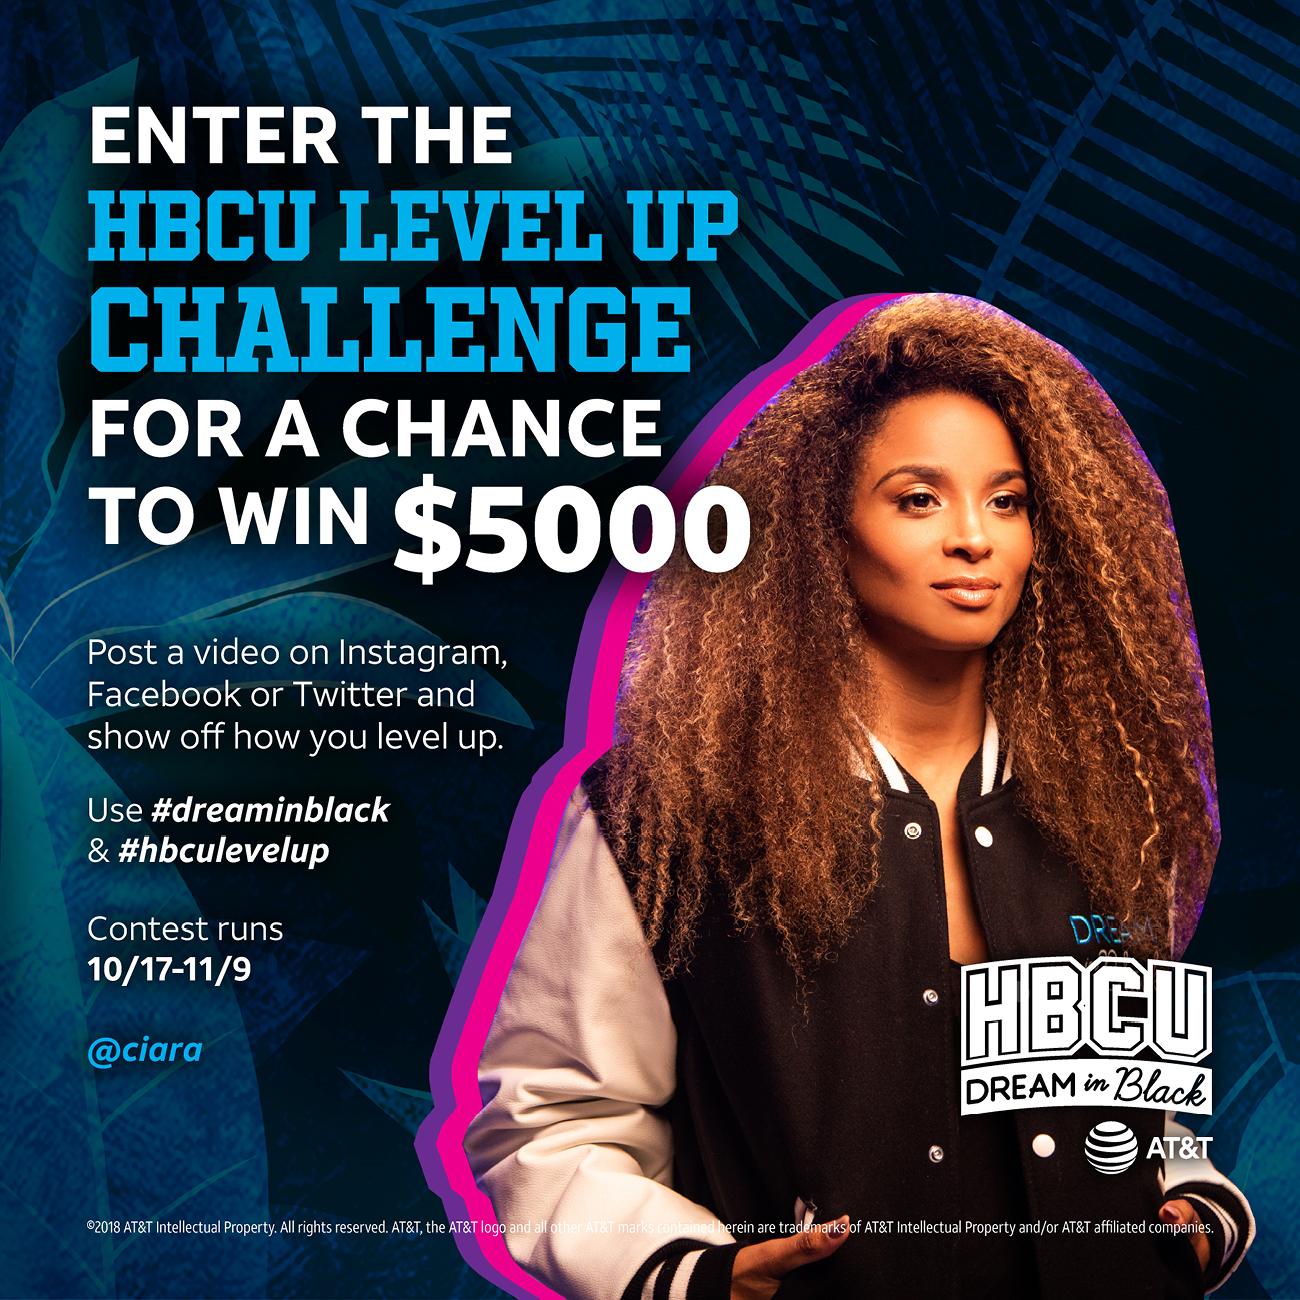 HBCU Level Up Challenge